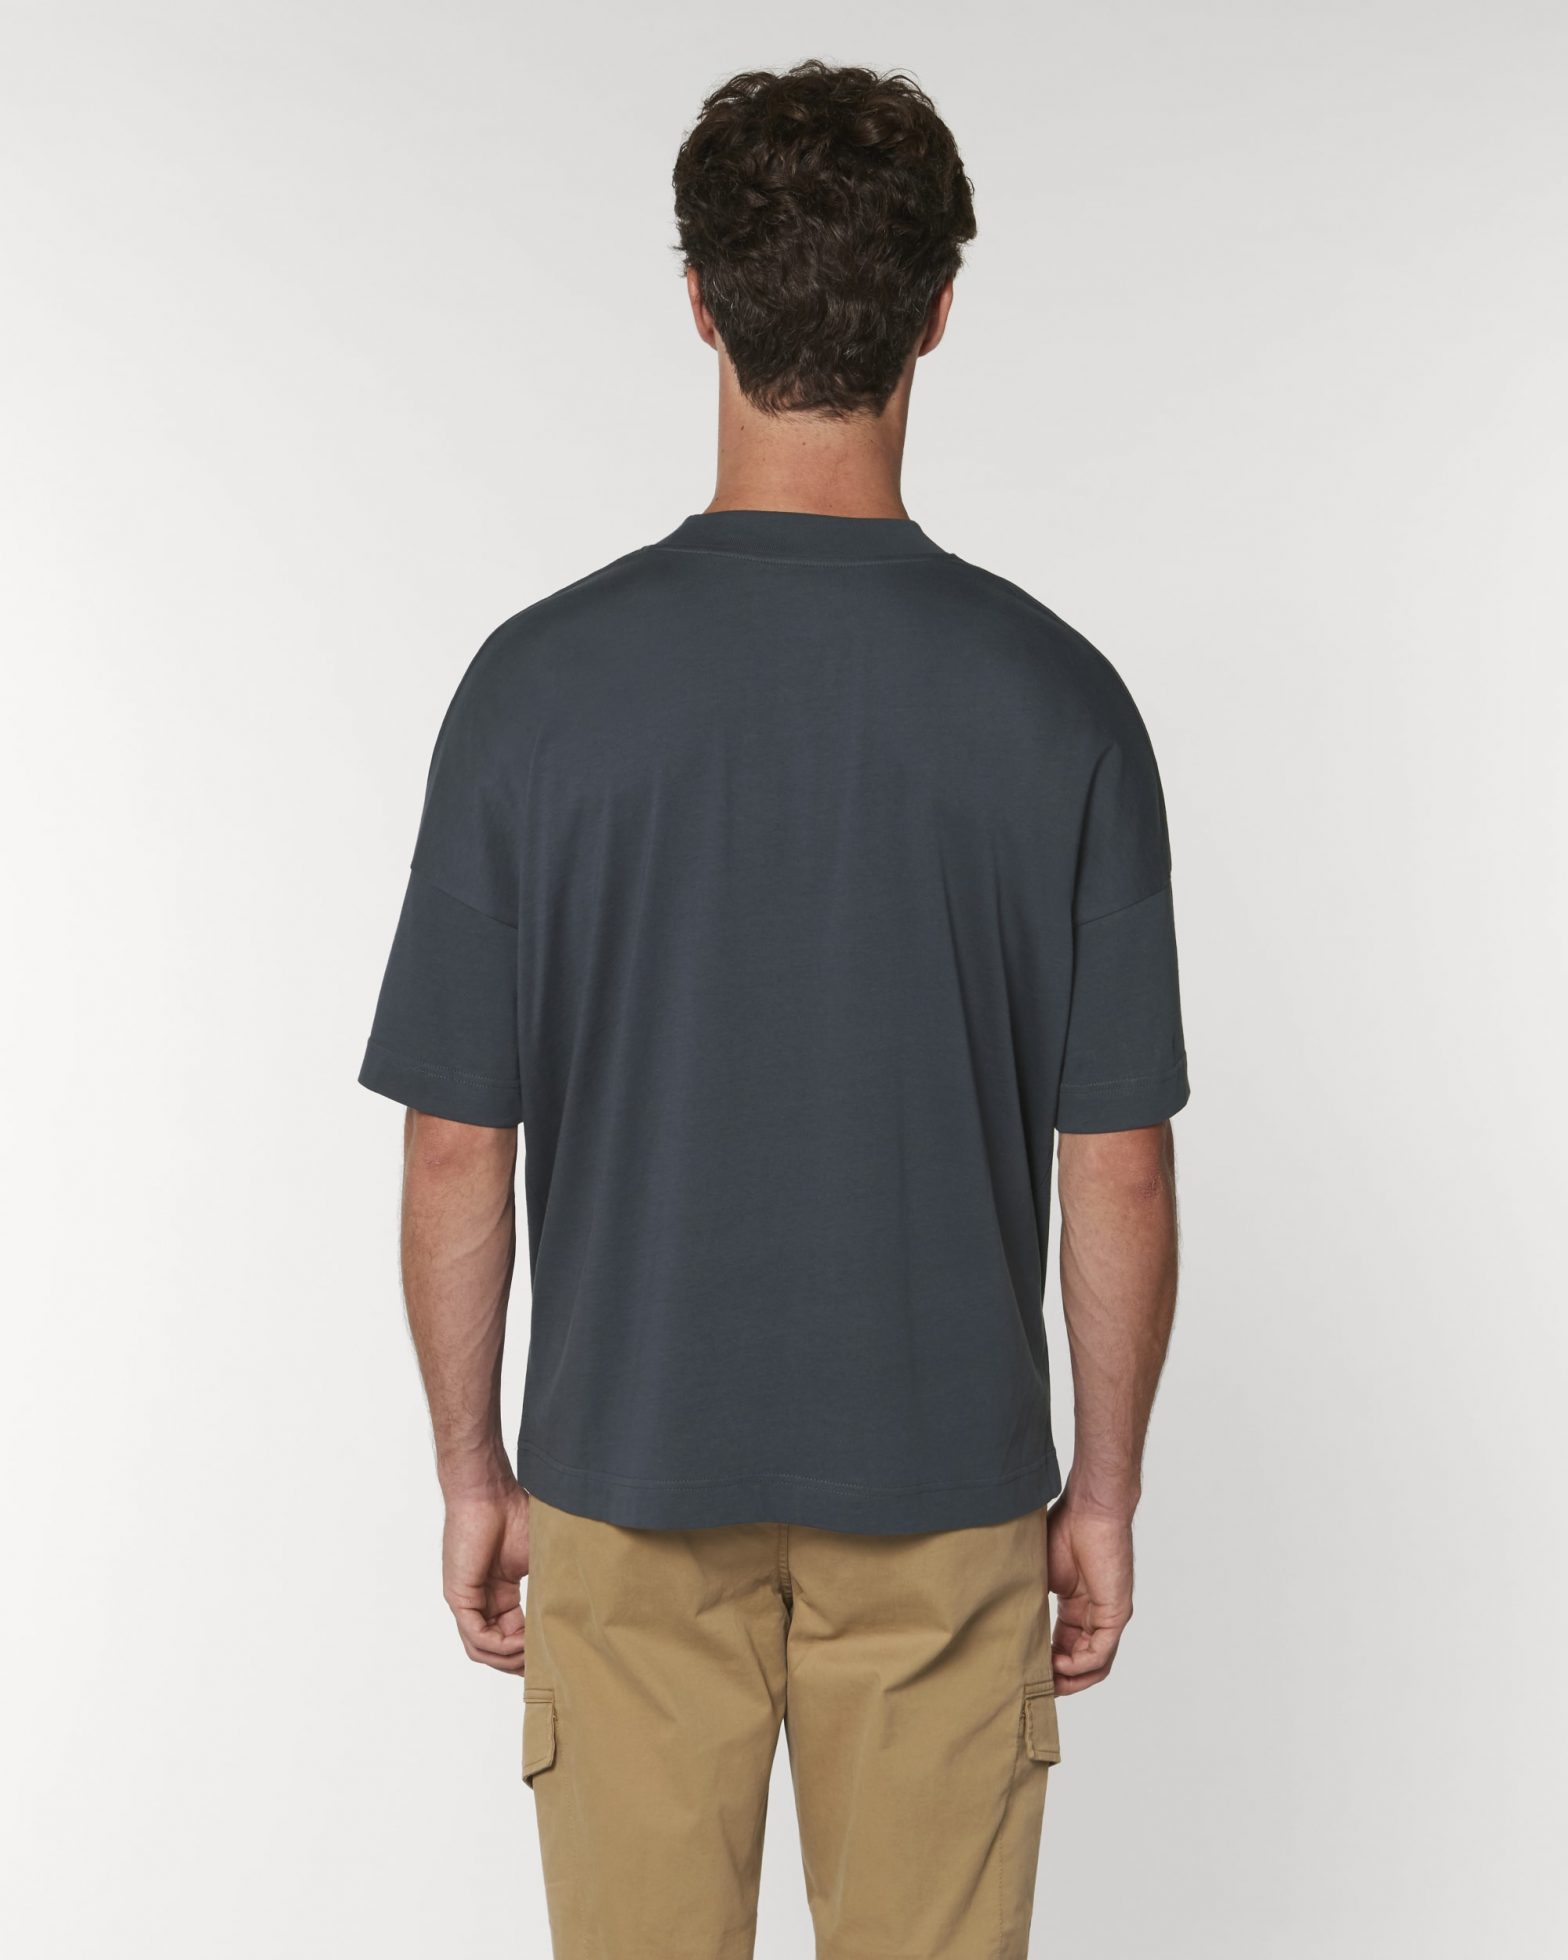 Organic Oversized T-shirt